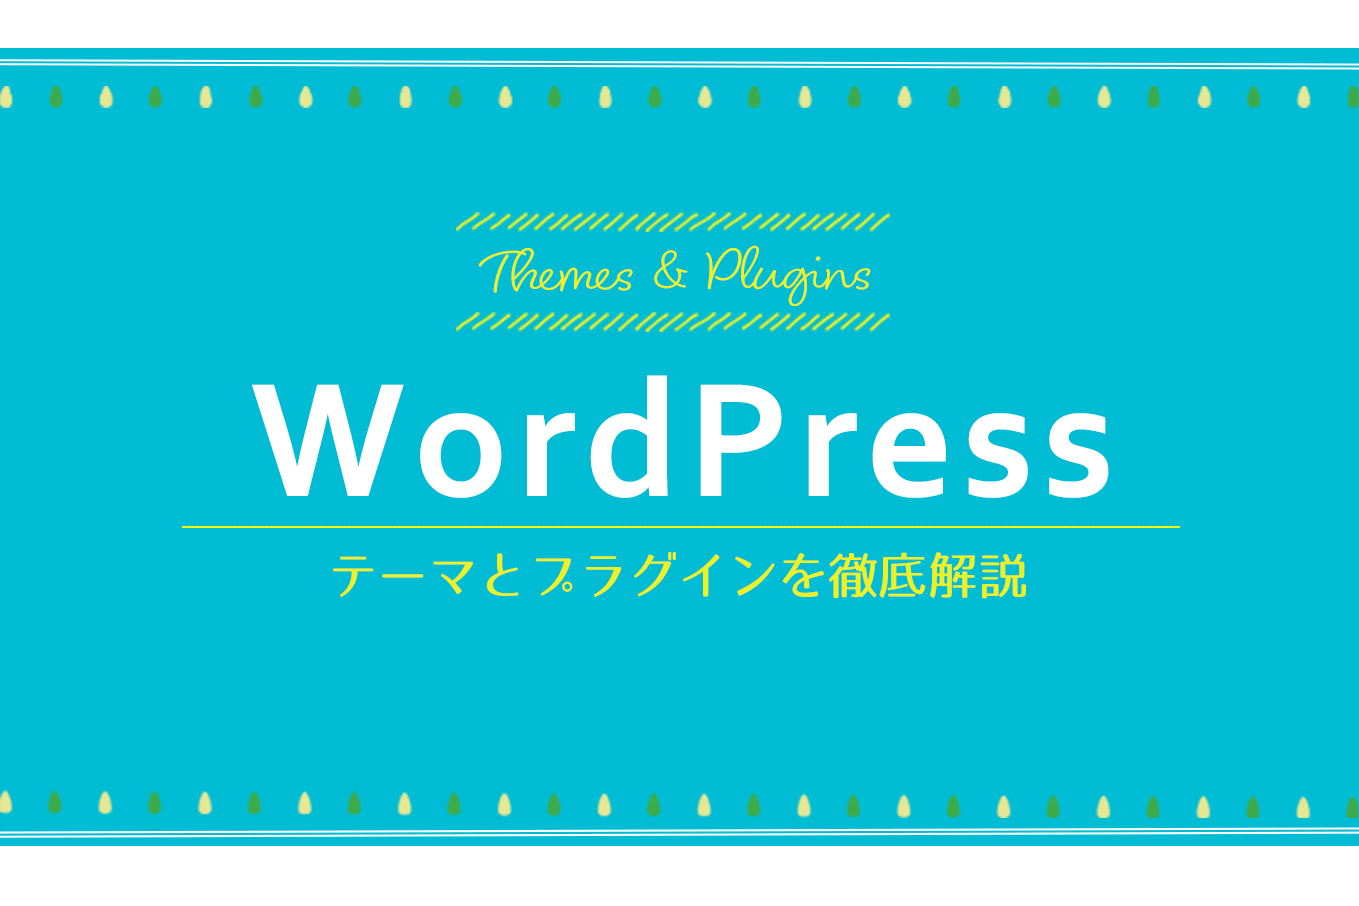 WordPress テーマとプラグインを徹底解説 第2回 WordPressテーマ作成(1)